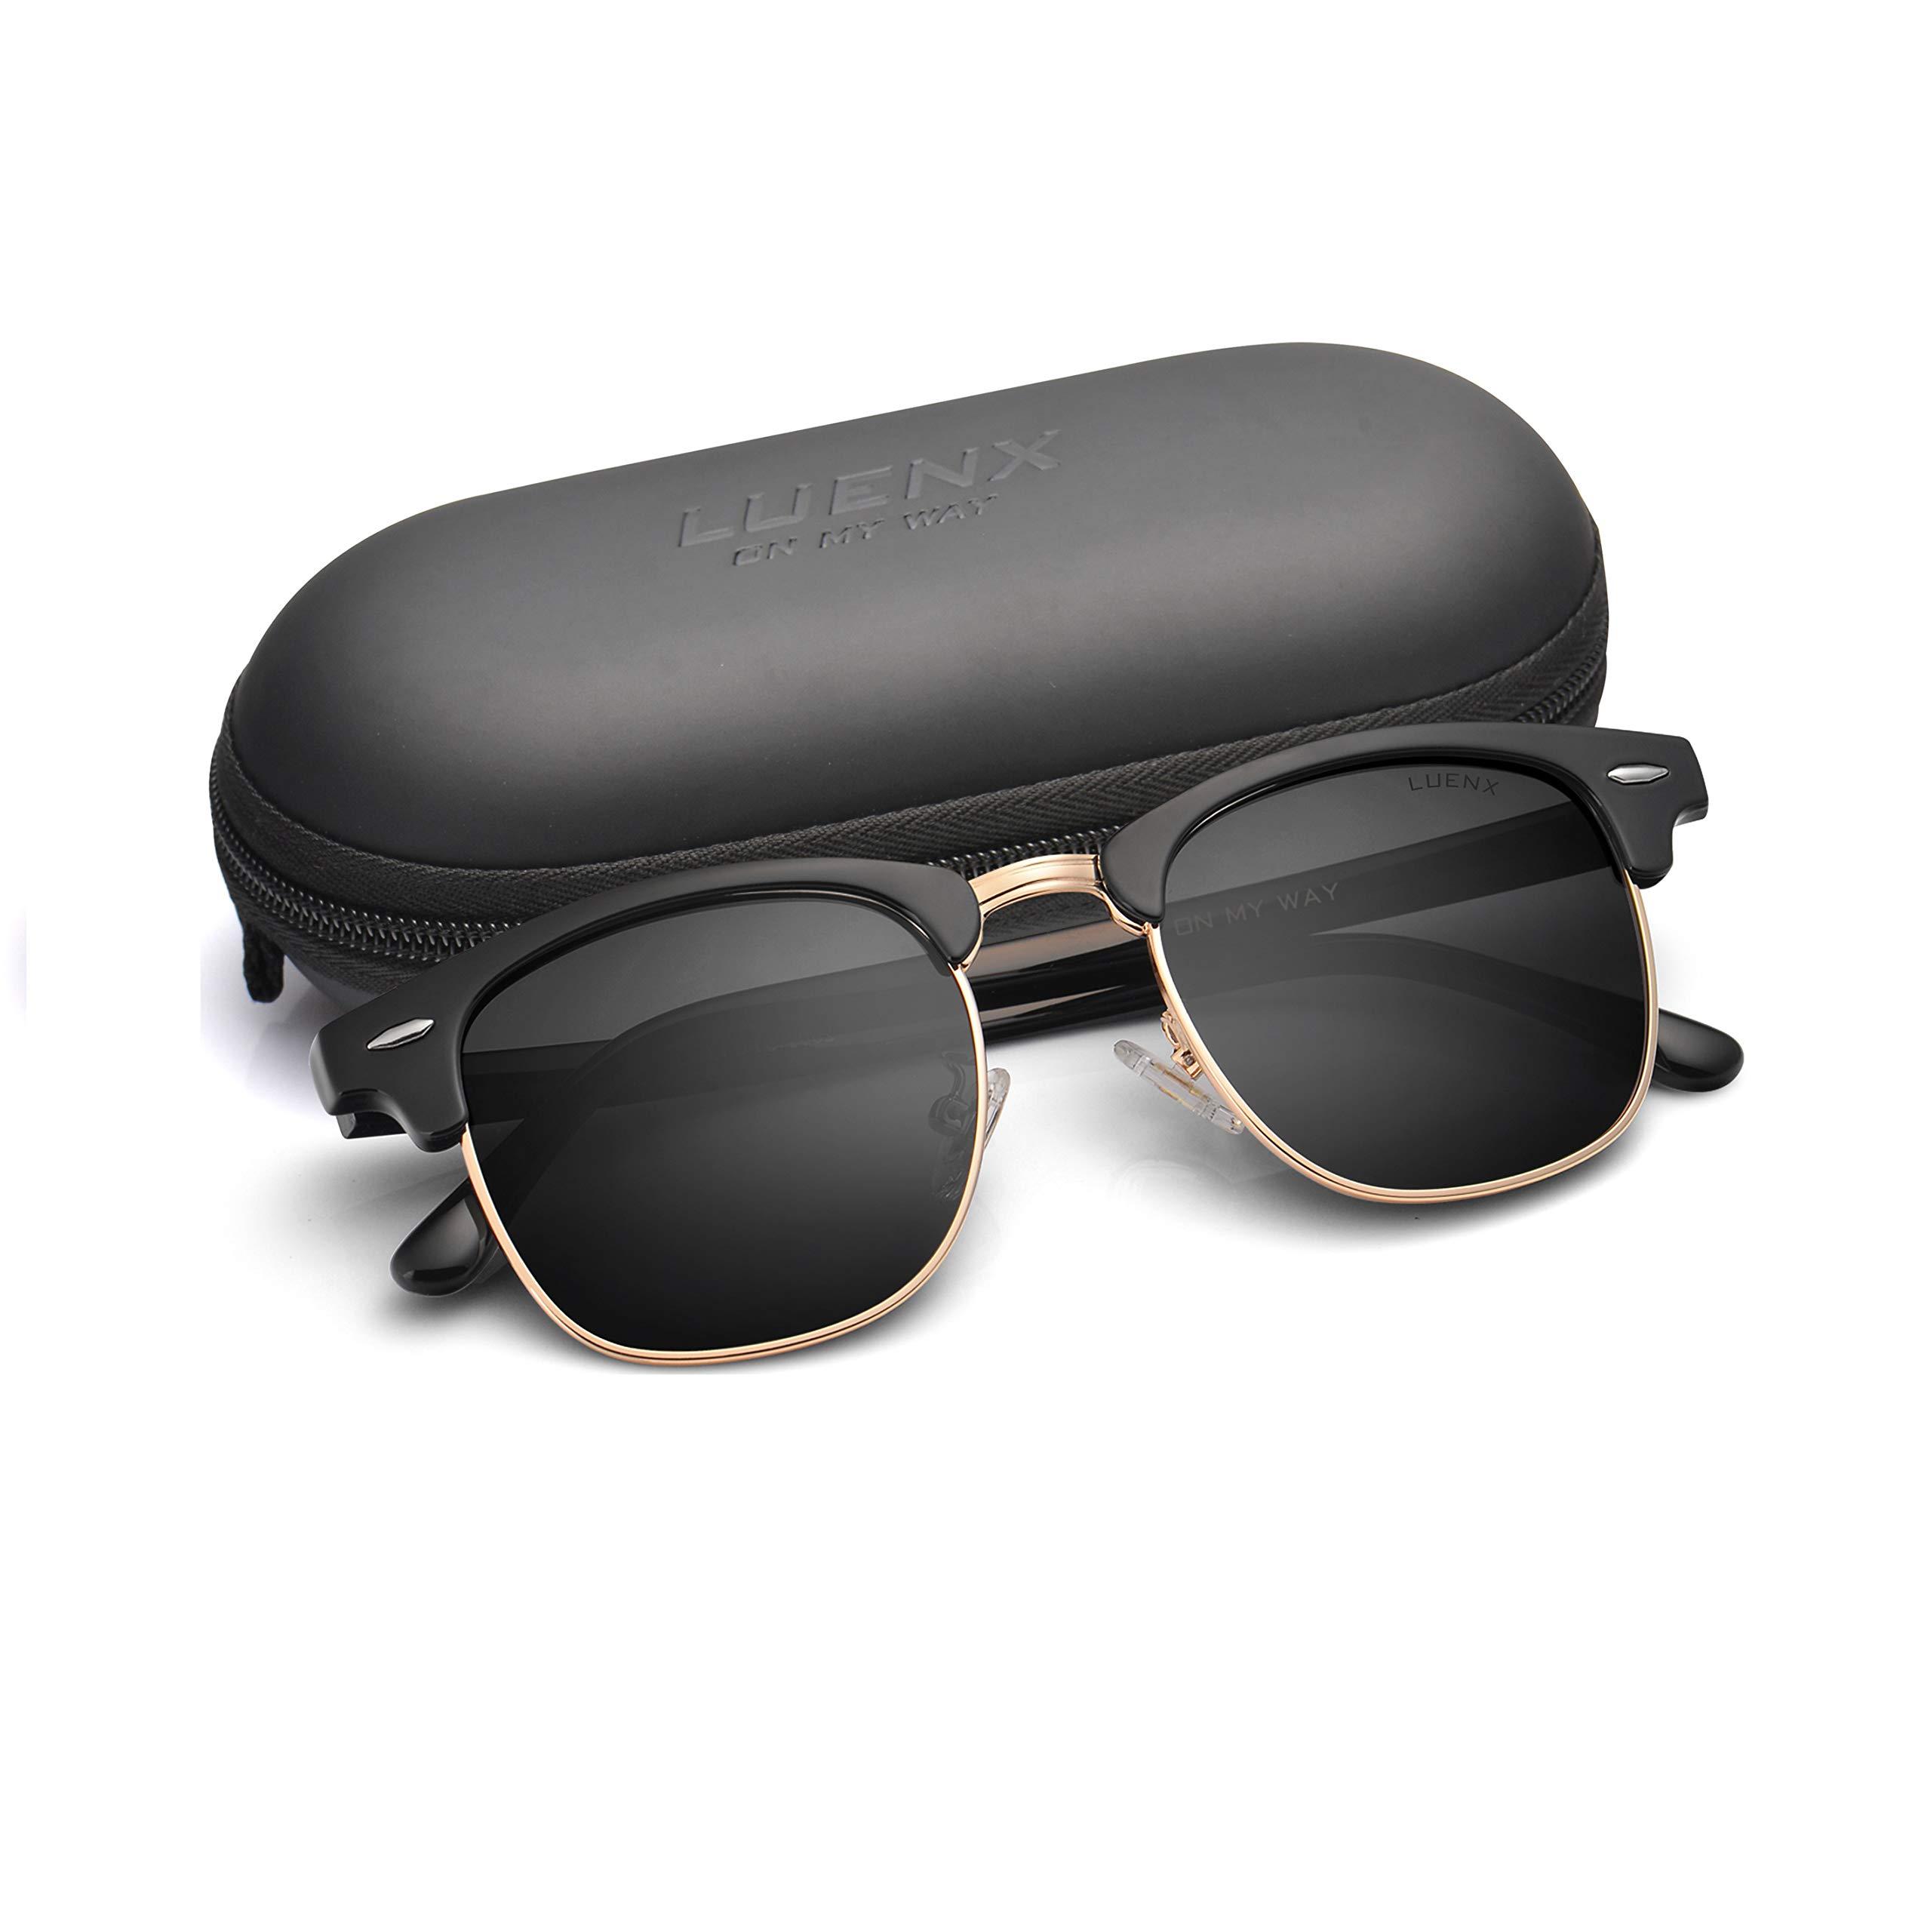 LUENX Men Women Semi Rimless Polarized Sunglasses:UV 400 Protection 51MM with Case (23 Black(Matte Frame)/Non-mirror, 51) by LUENX